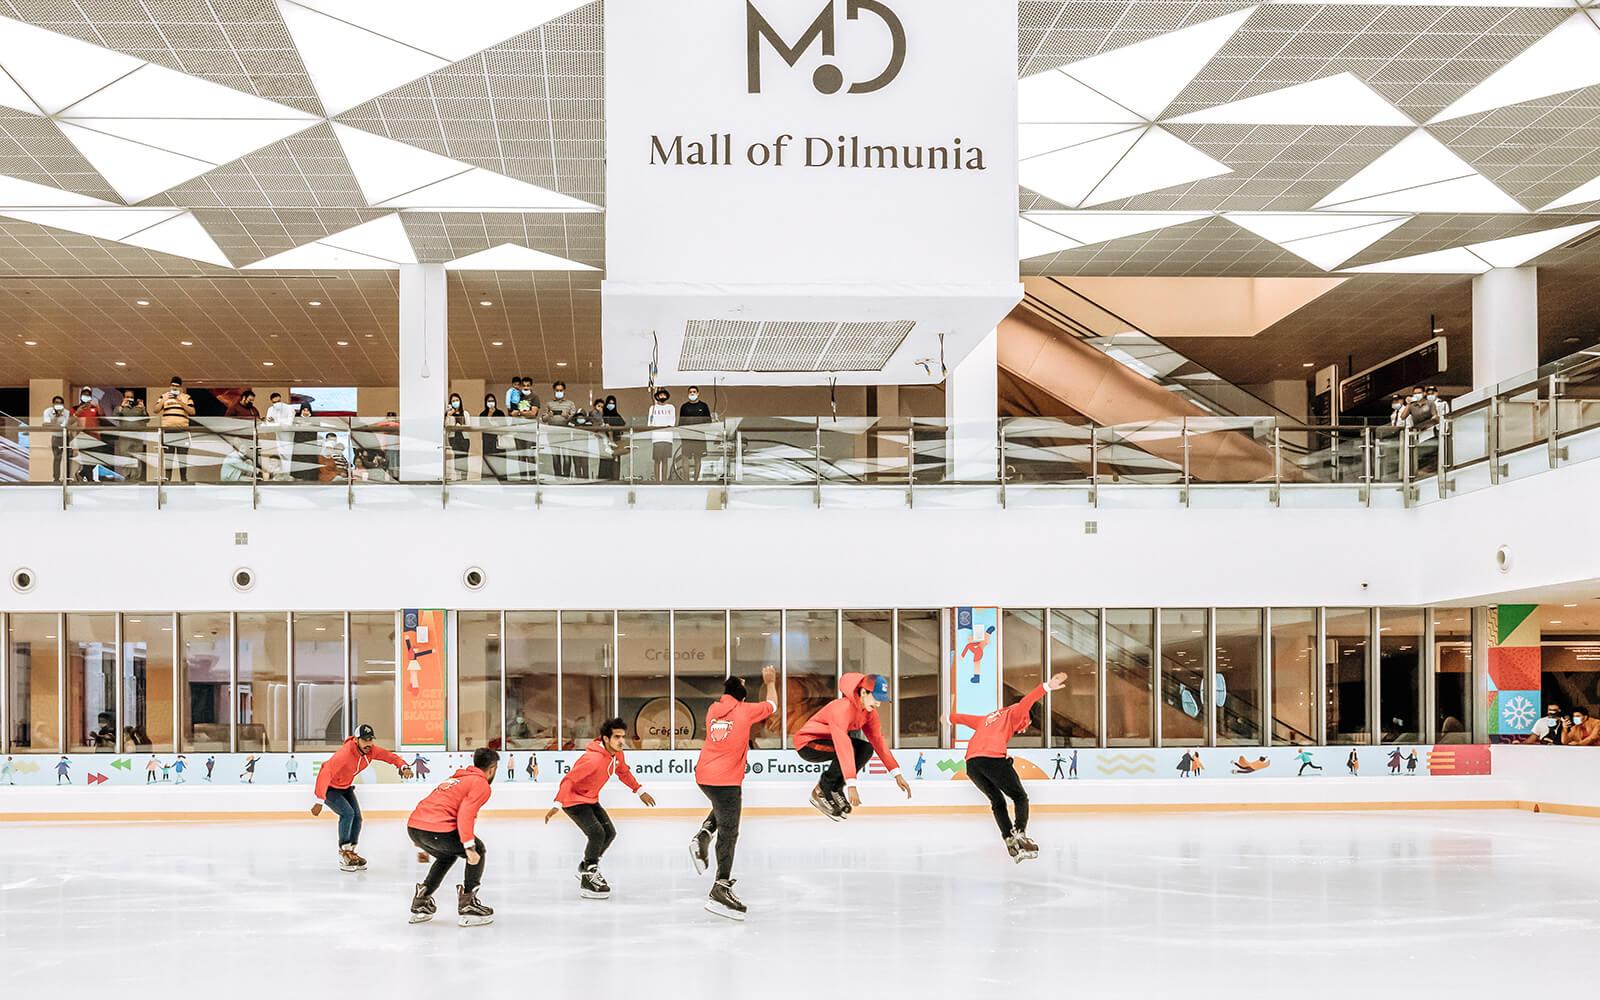 Mall of Dilmunia Turns On The Festive Spirit